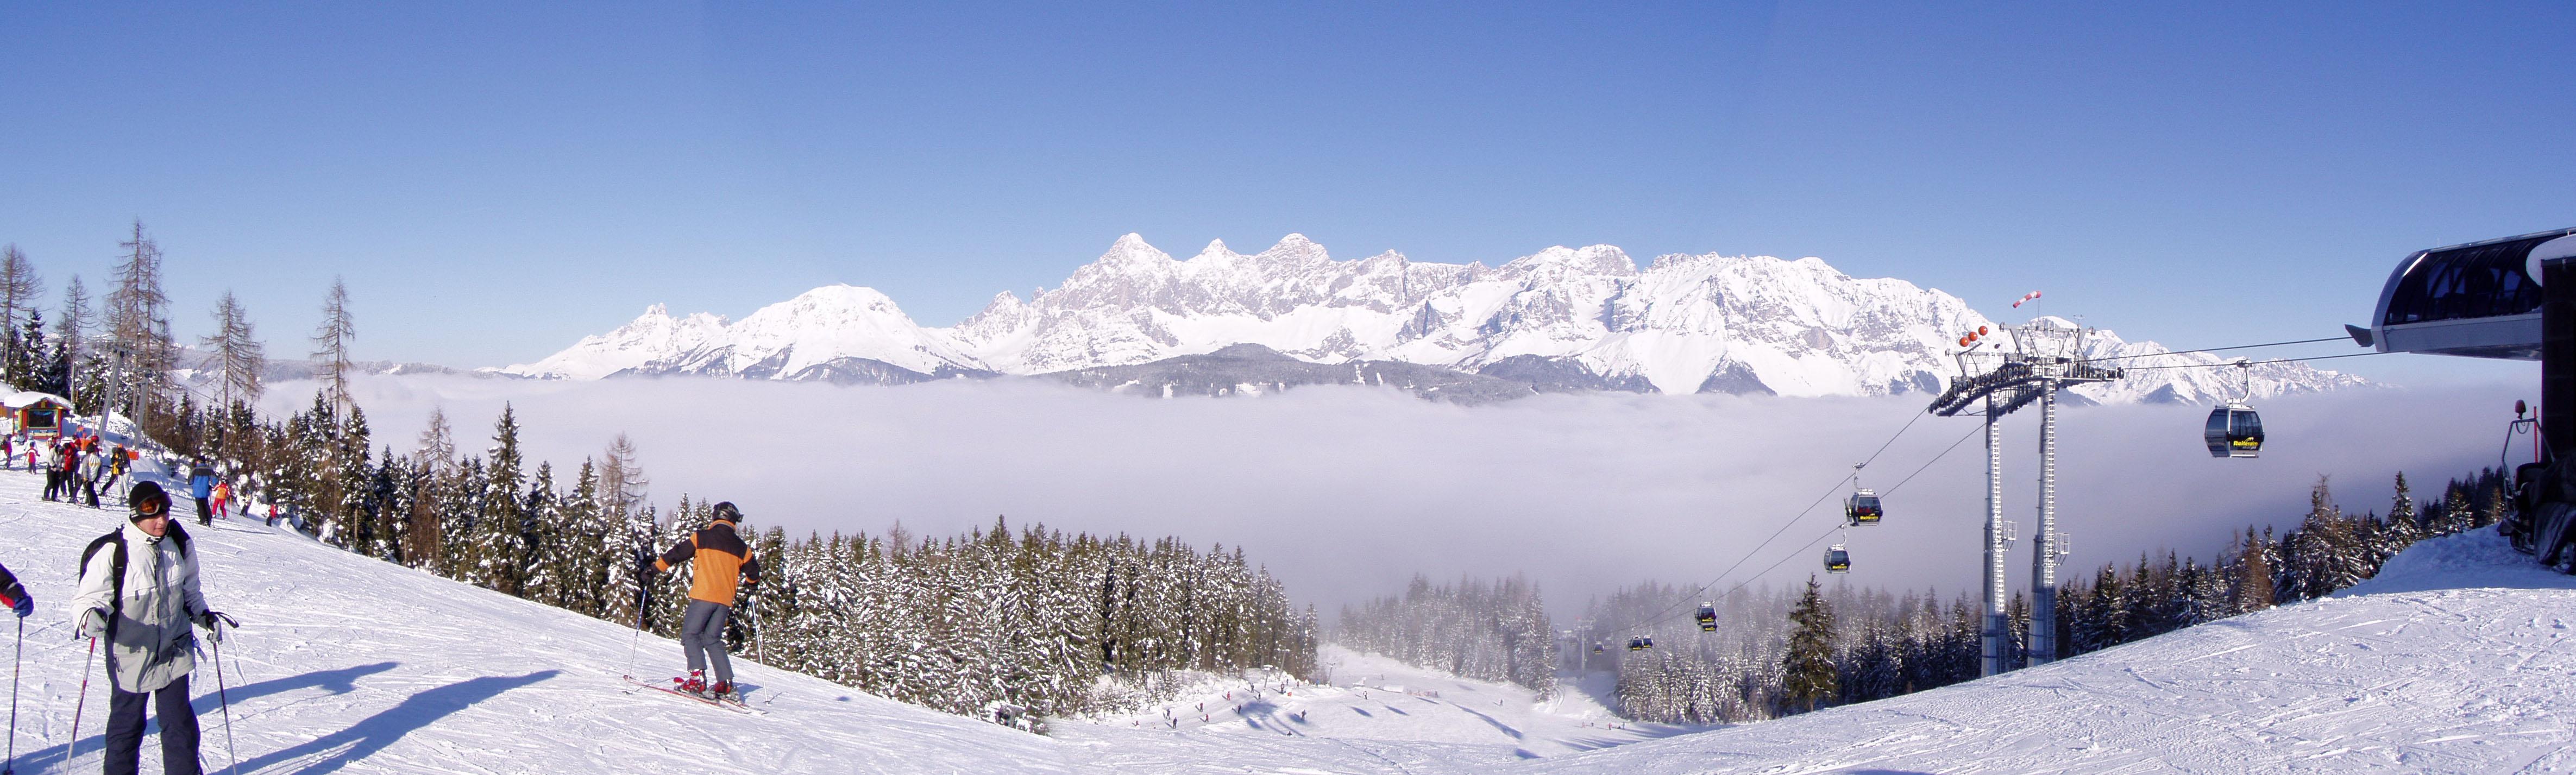 skihytter.eu